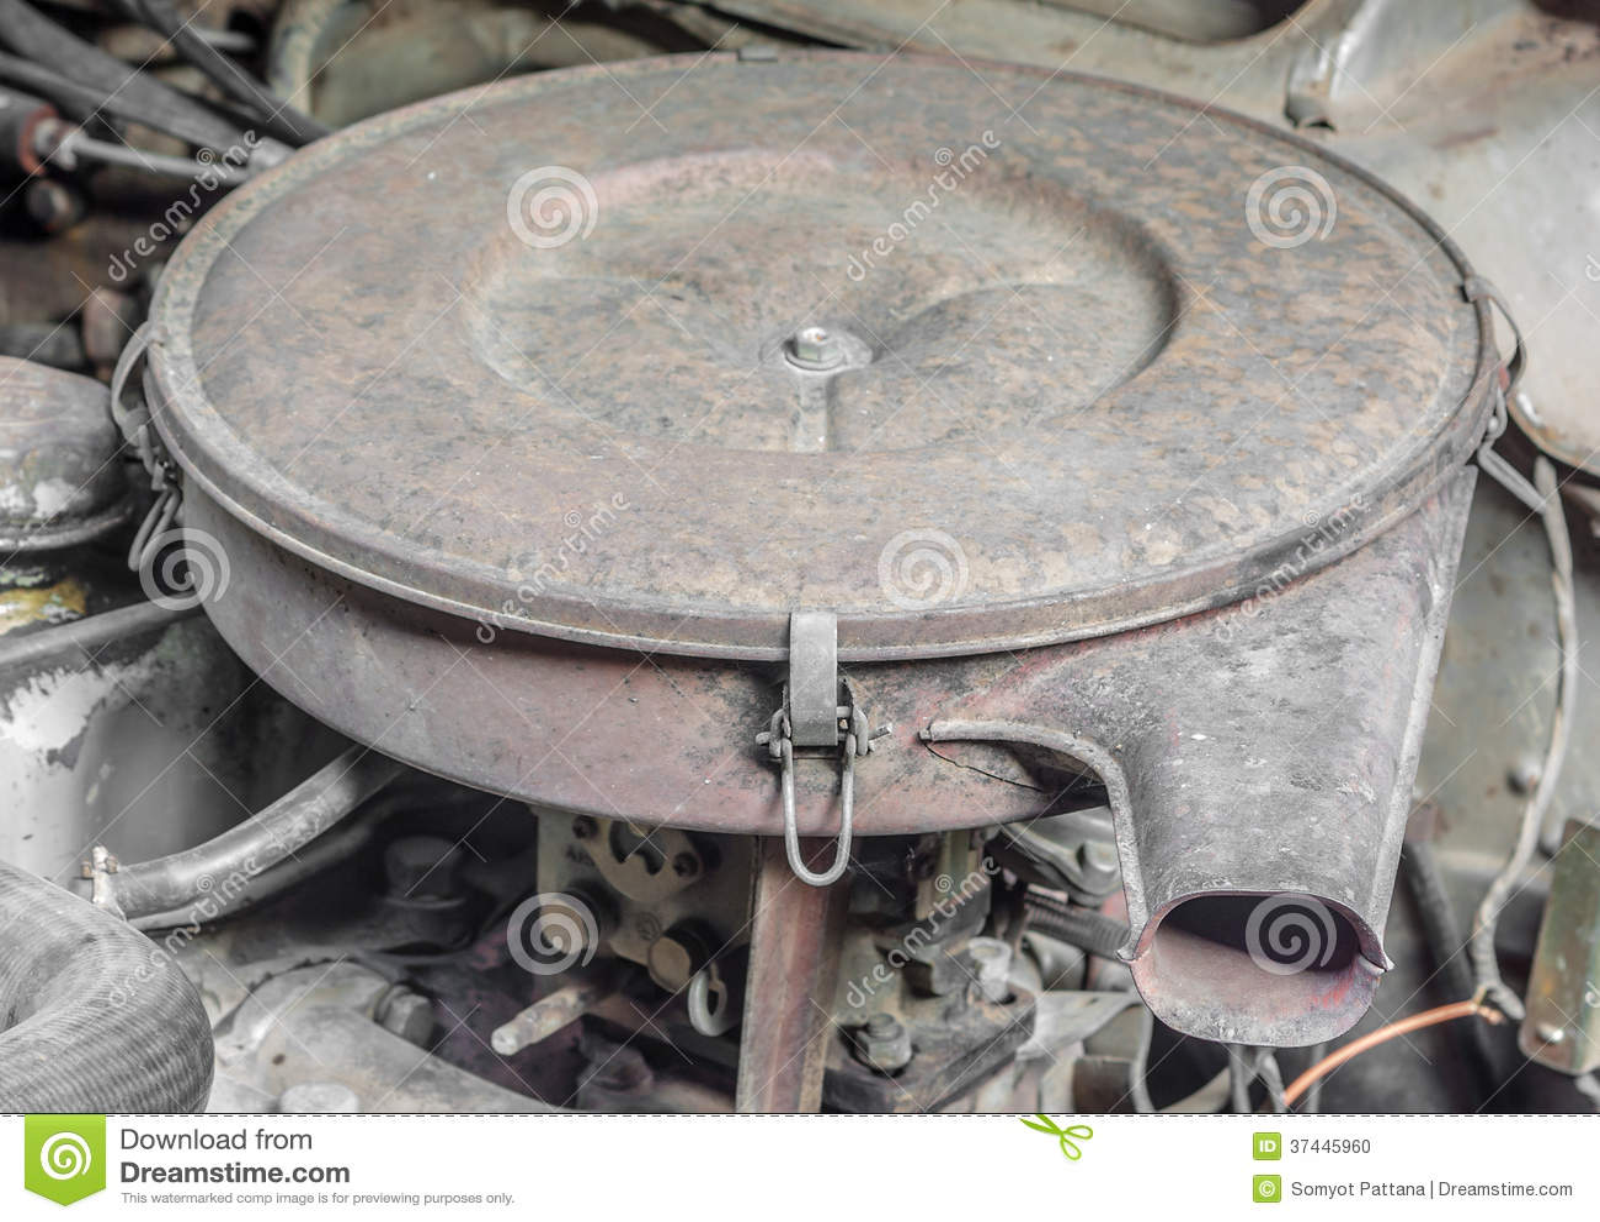 Engine Air Filter Housings : Filter housing industrial engine air